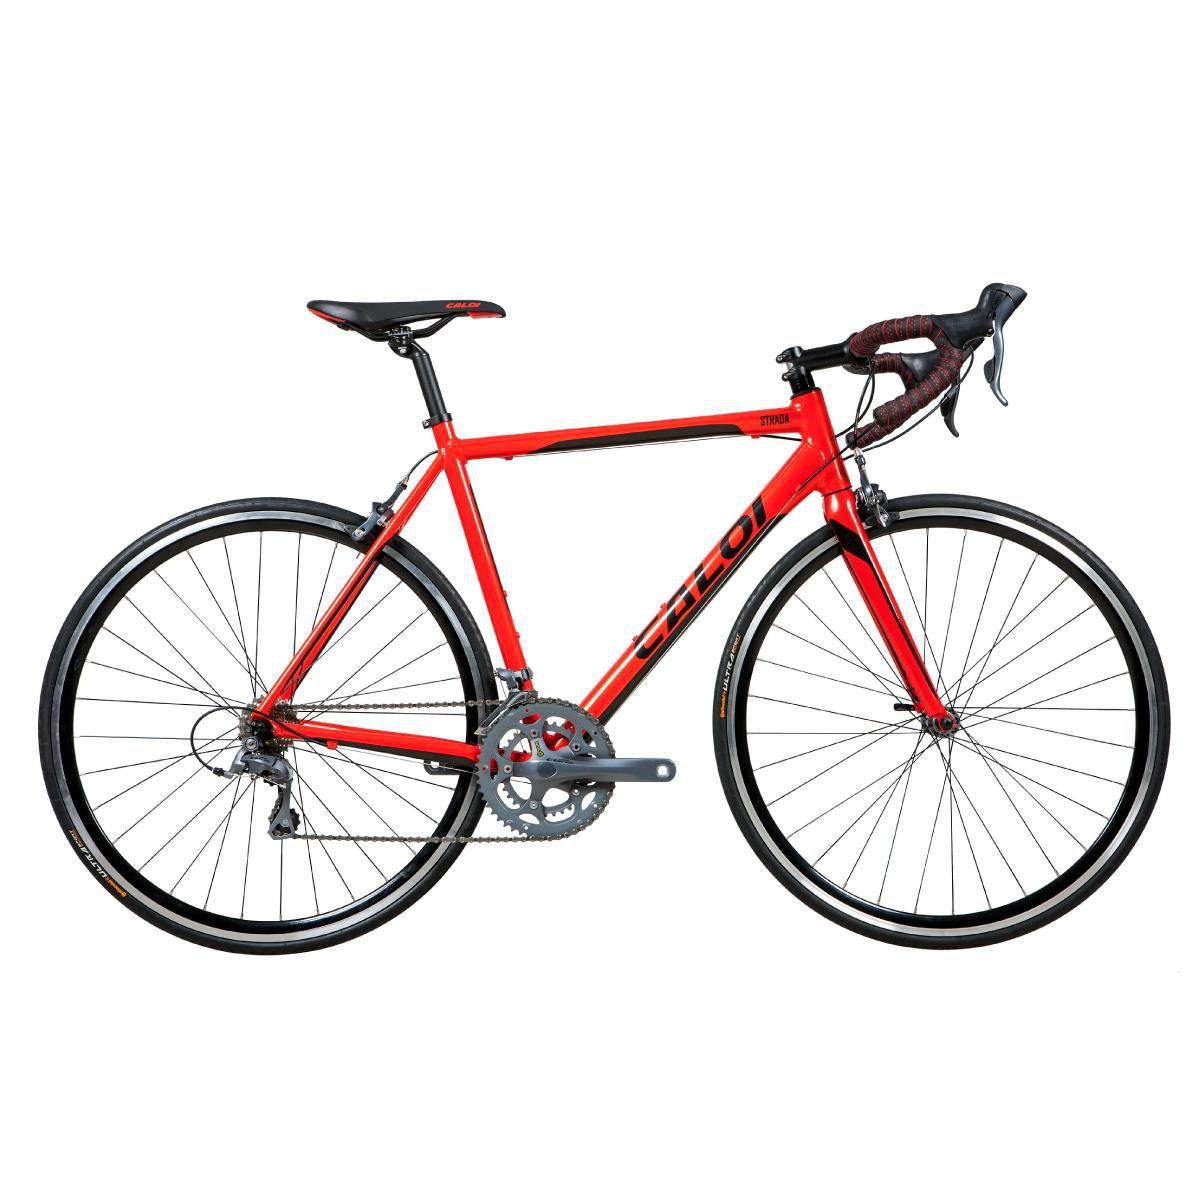 Bicicleta Caloi Strada 2020 Shimano Claris 16v 700